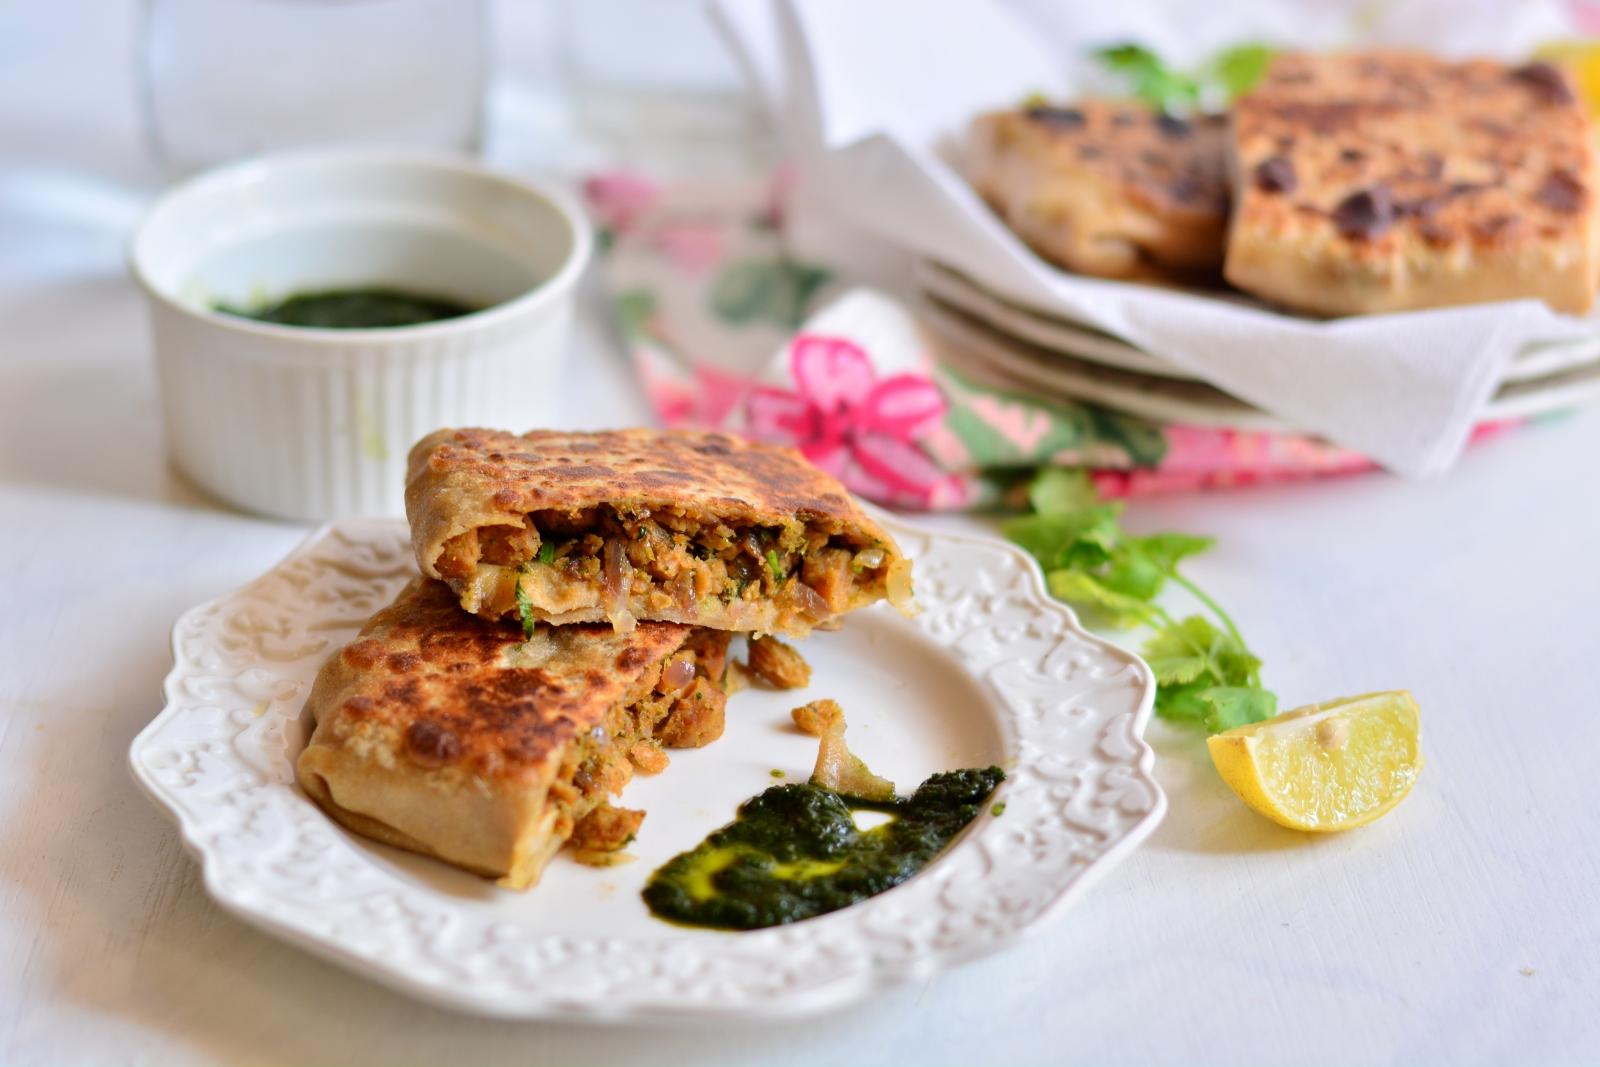 Mughlai keema paratha recipe by archanas kitchen mughlai keema paratha recipe forumfinder Choice Image